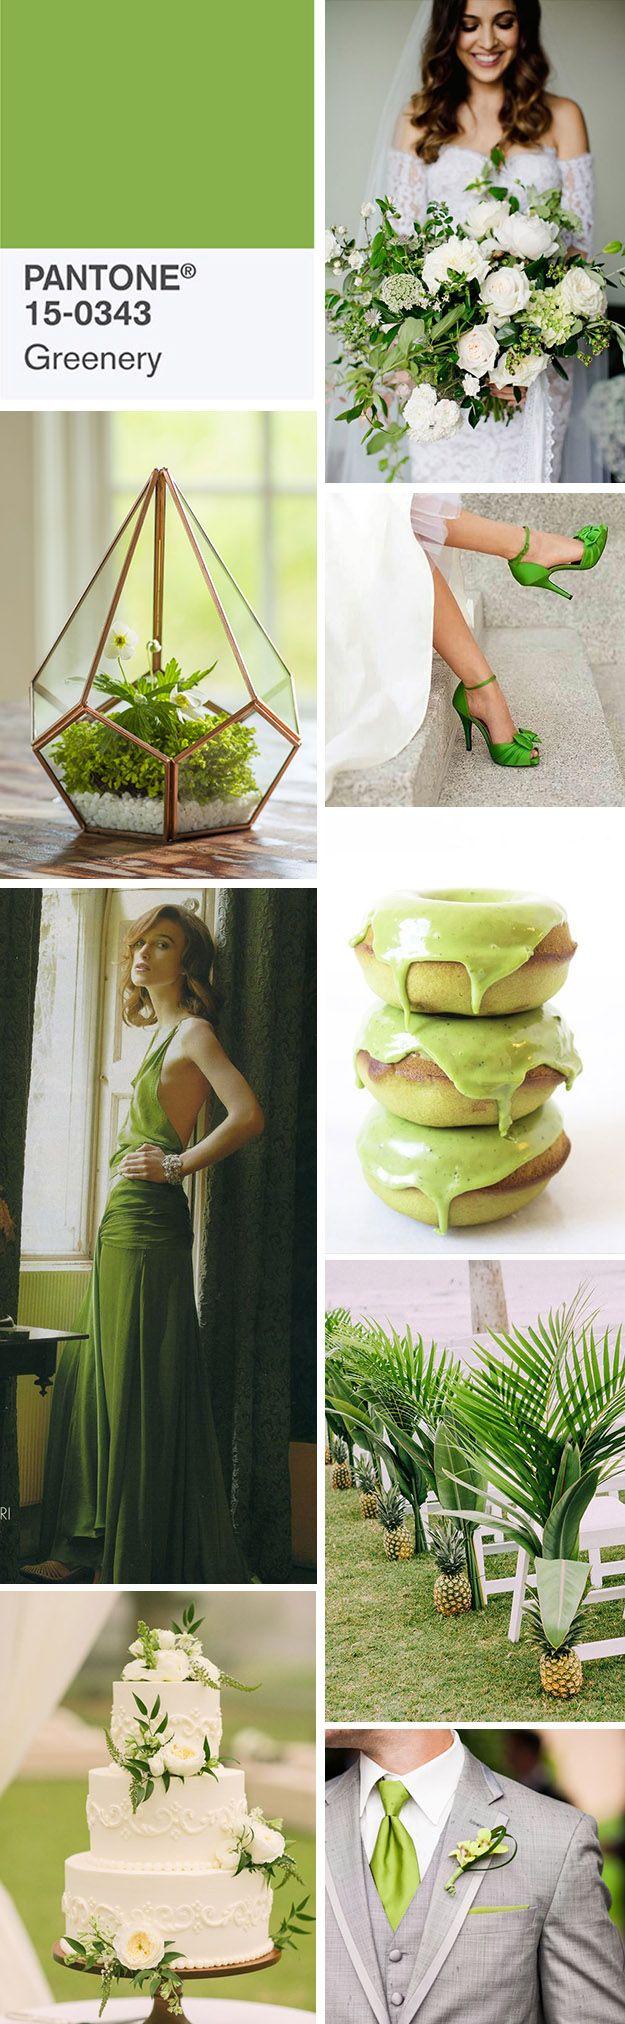 Greenery Wedding // Greenery Pantone color of the year 2017 // Green Greenery Wedding //  Mariage vert greenery //